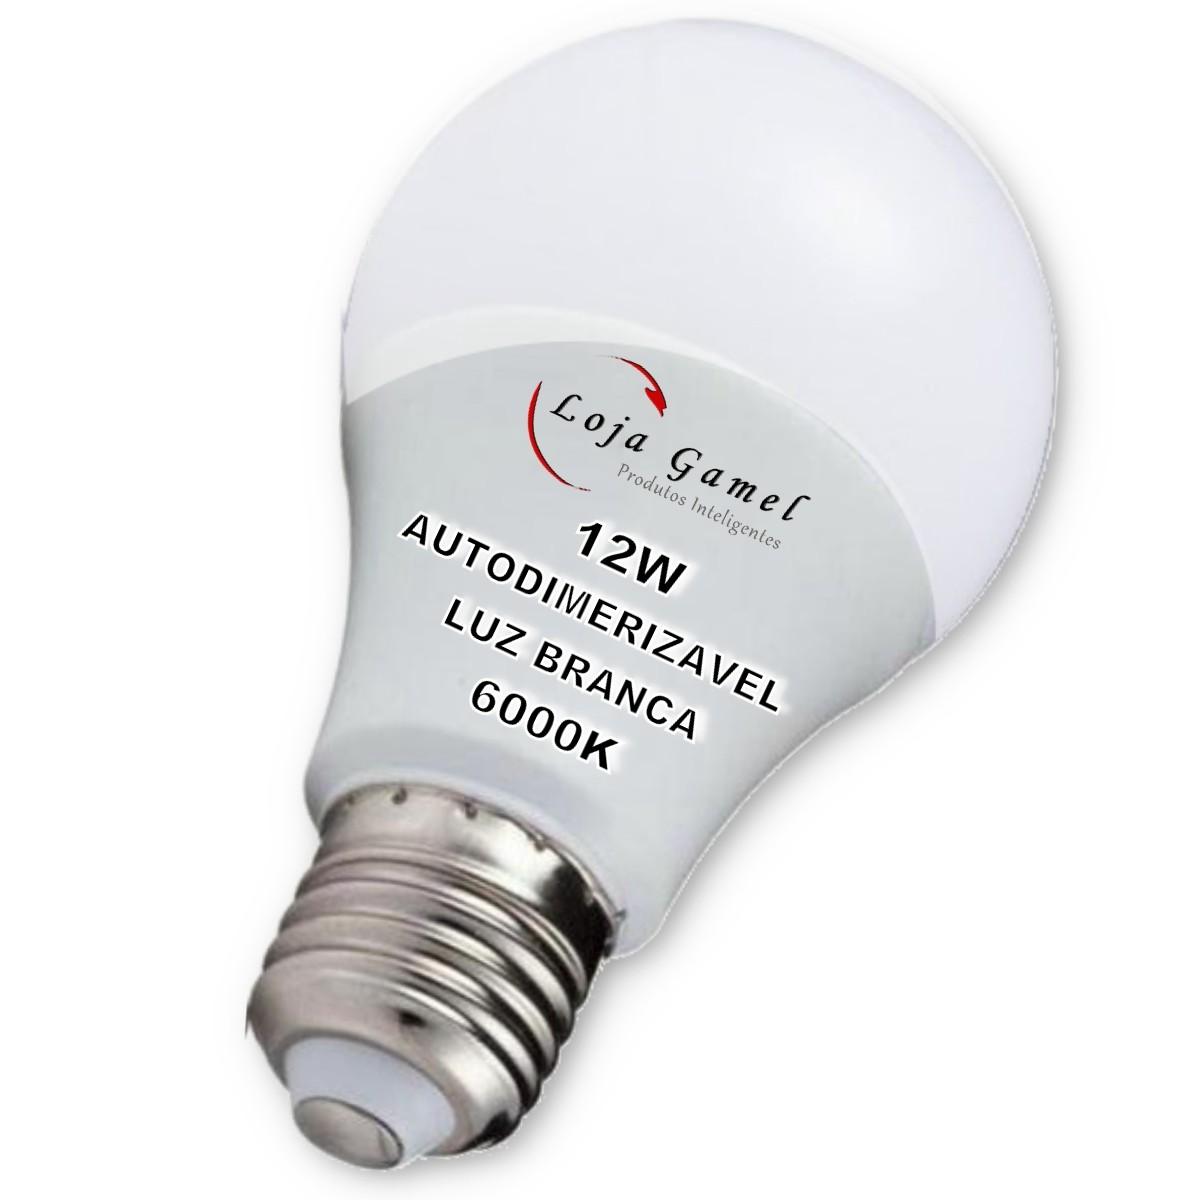 Foto4 - Lâmpada LED Bulbo Autodimerizável 12W Luz Branca 6000K Kit 6un